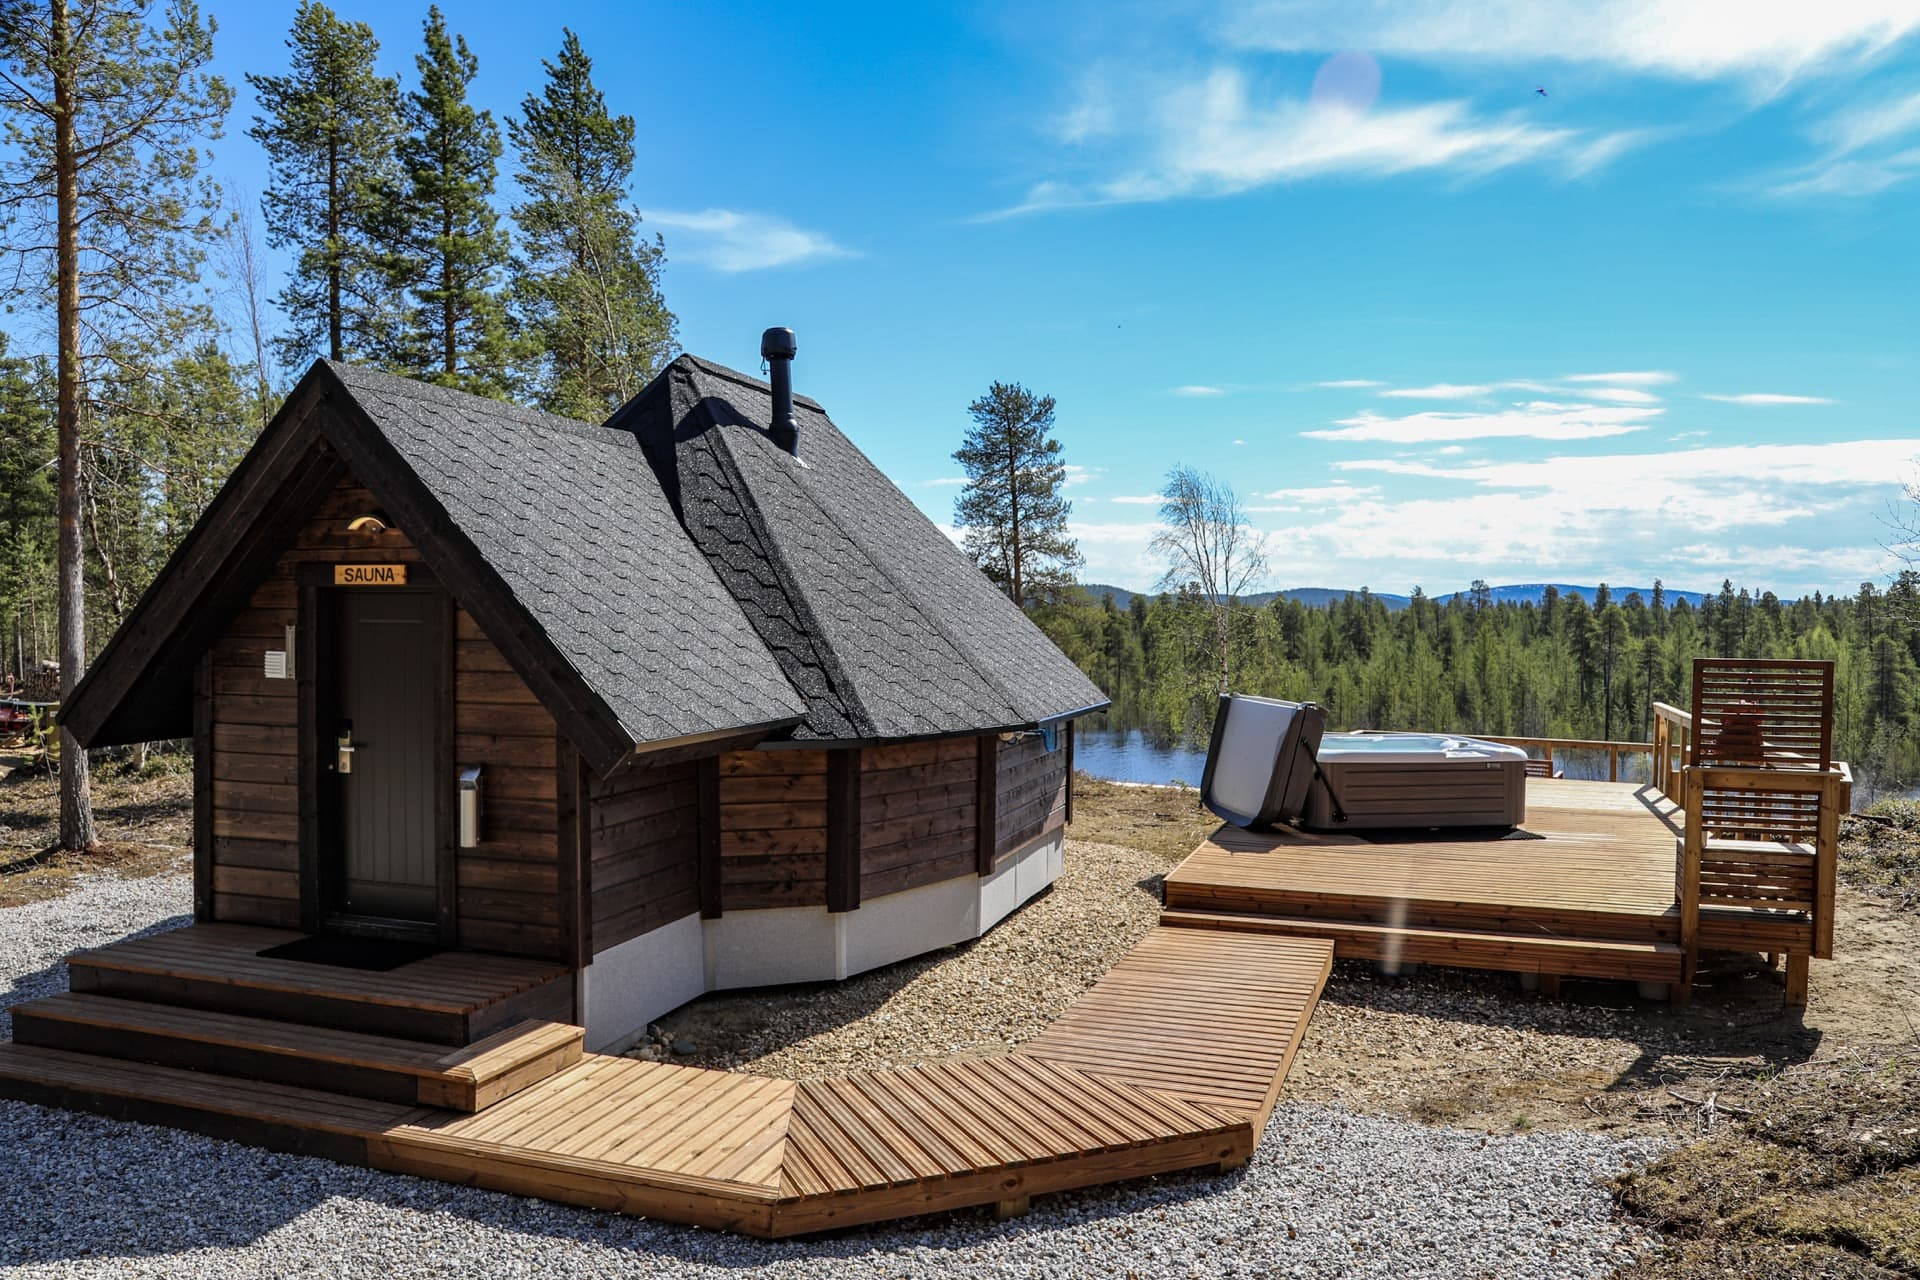 Enjoying winter at the Aurora Village Ivalo Lapland Finland.